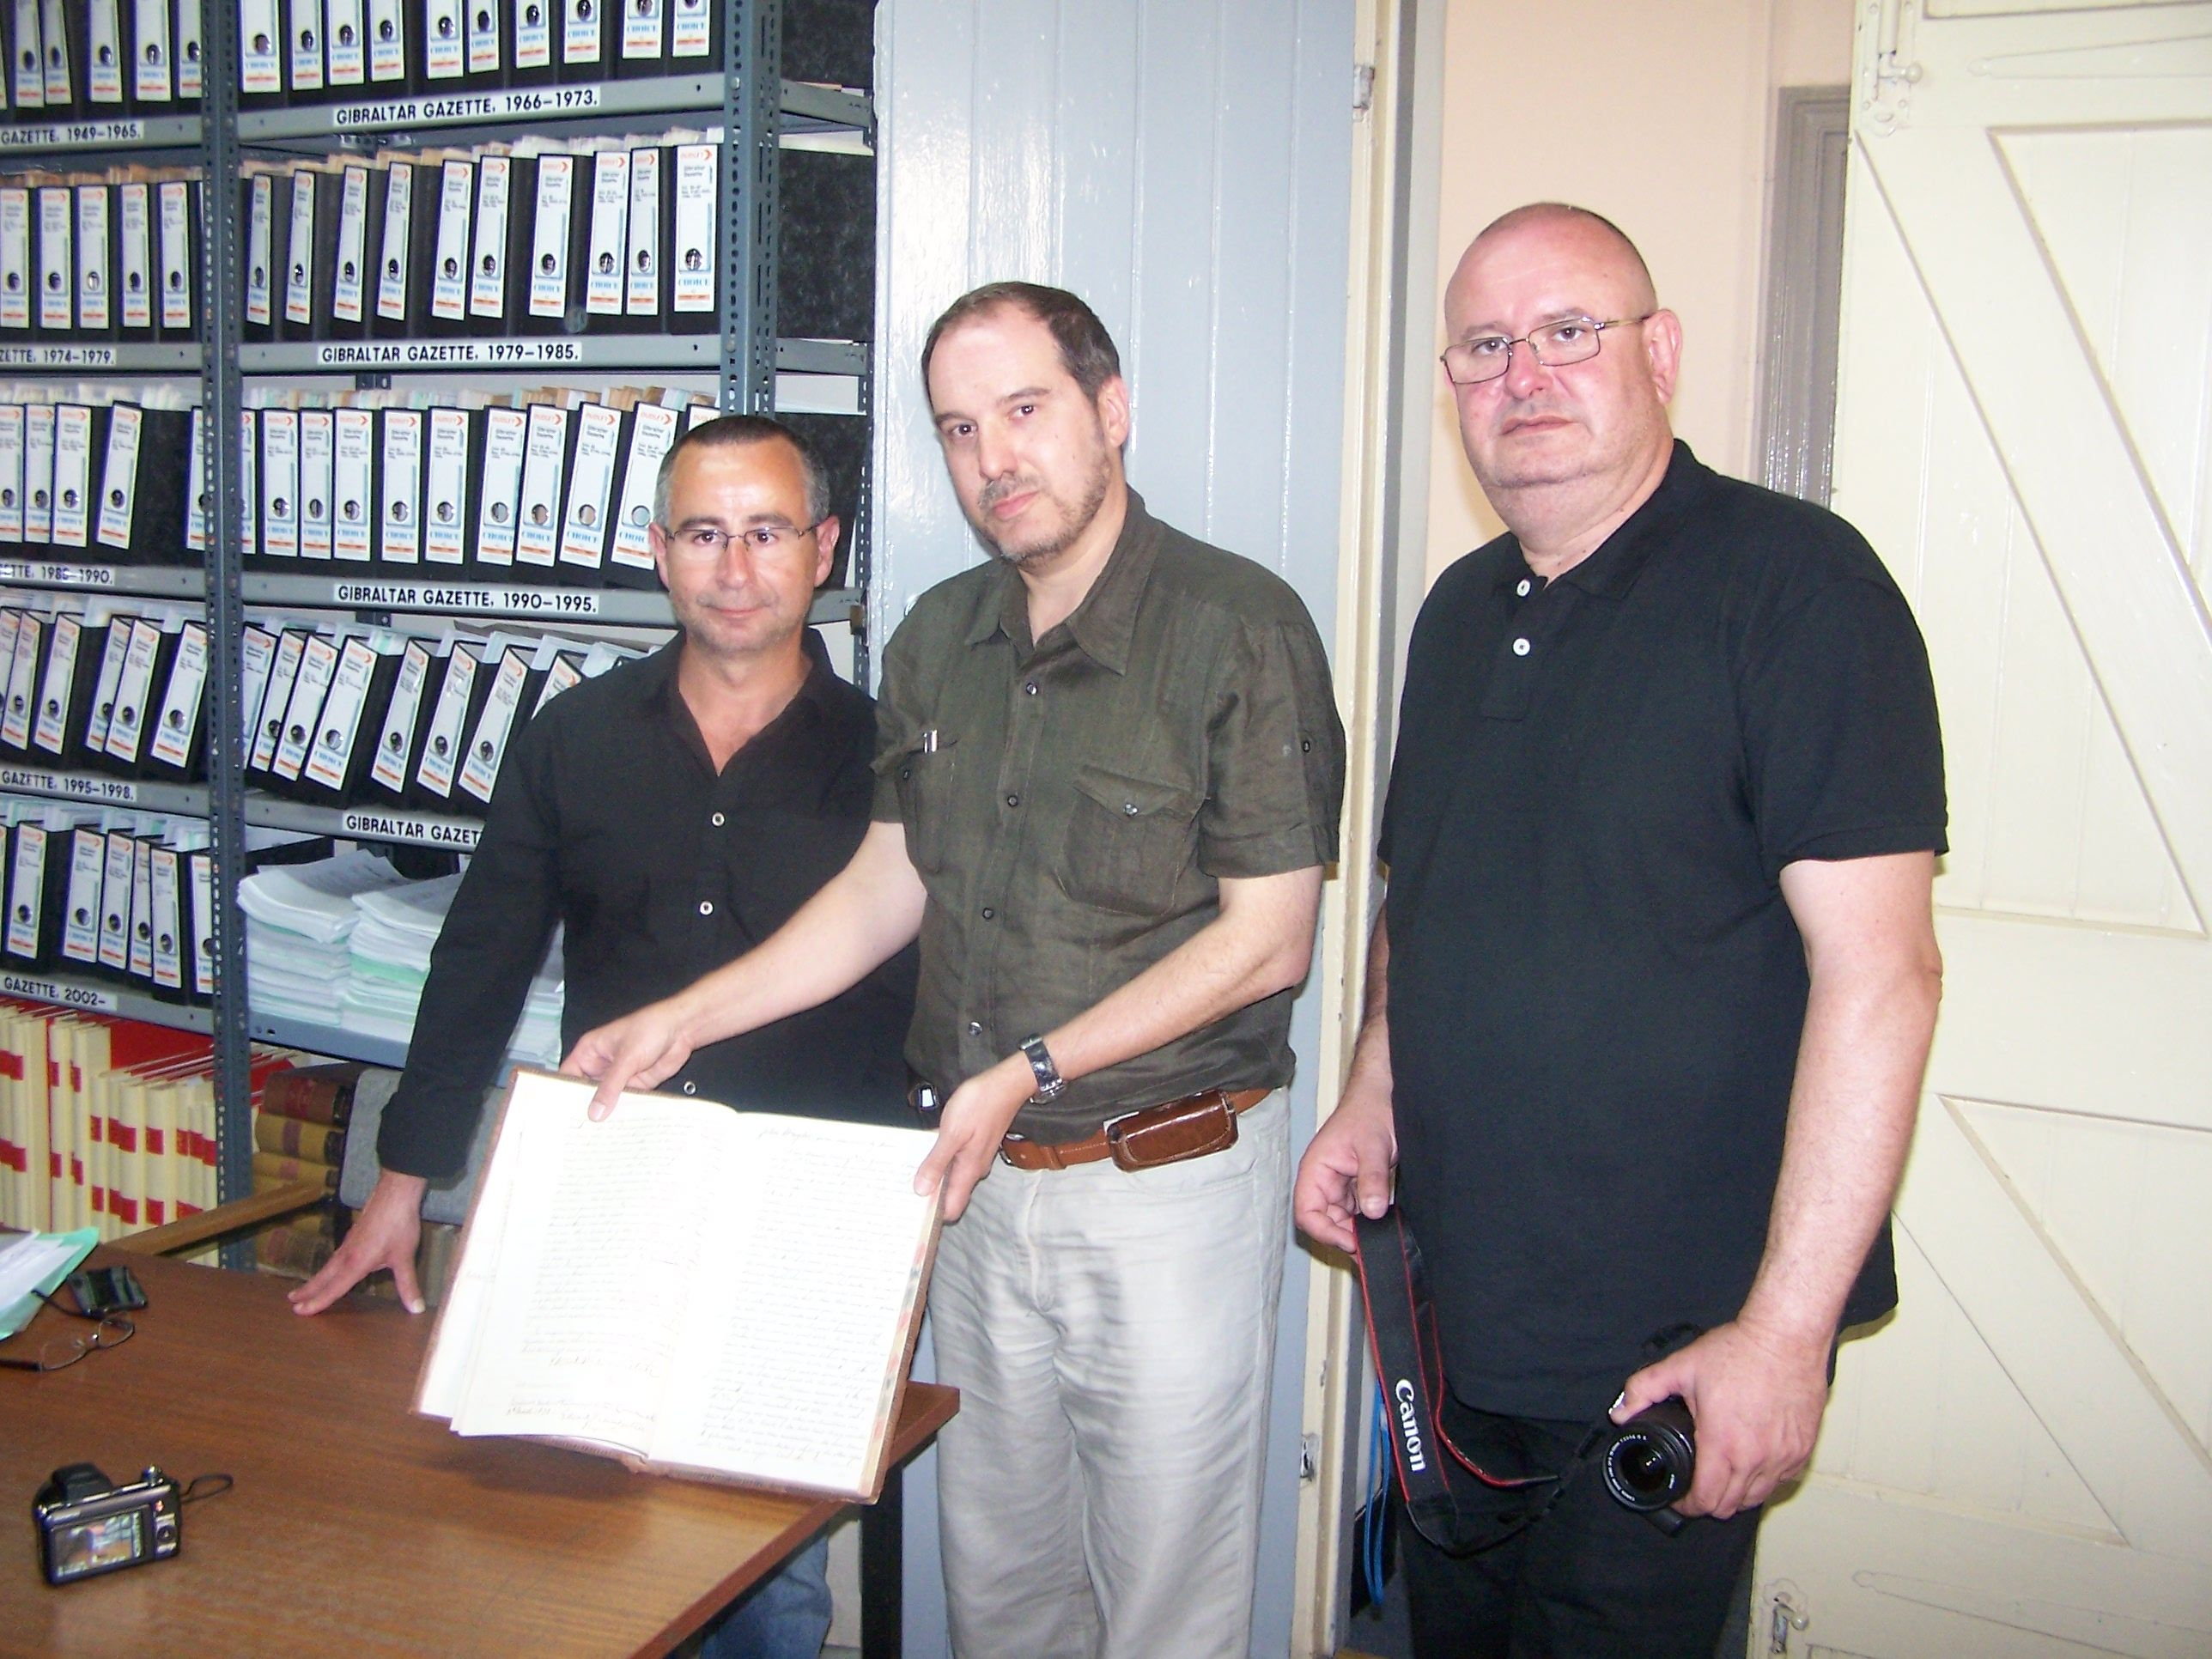 Cuarto milenio archives el reino de las sirenas for Cuarto milenio proximo programa